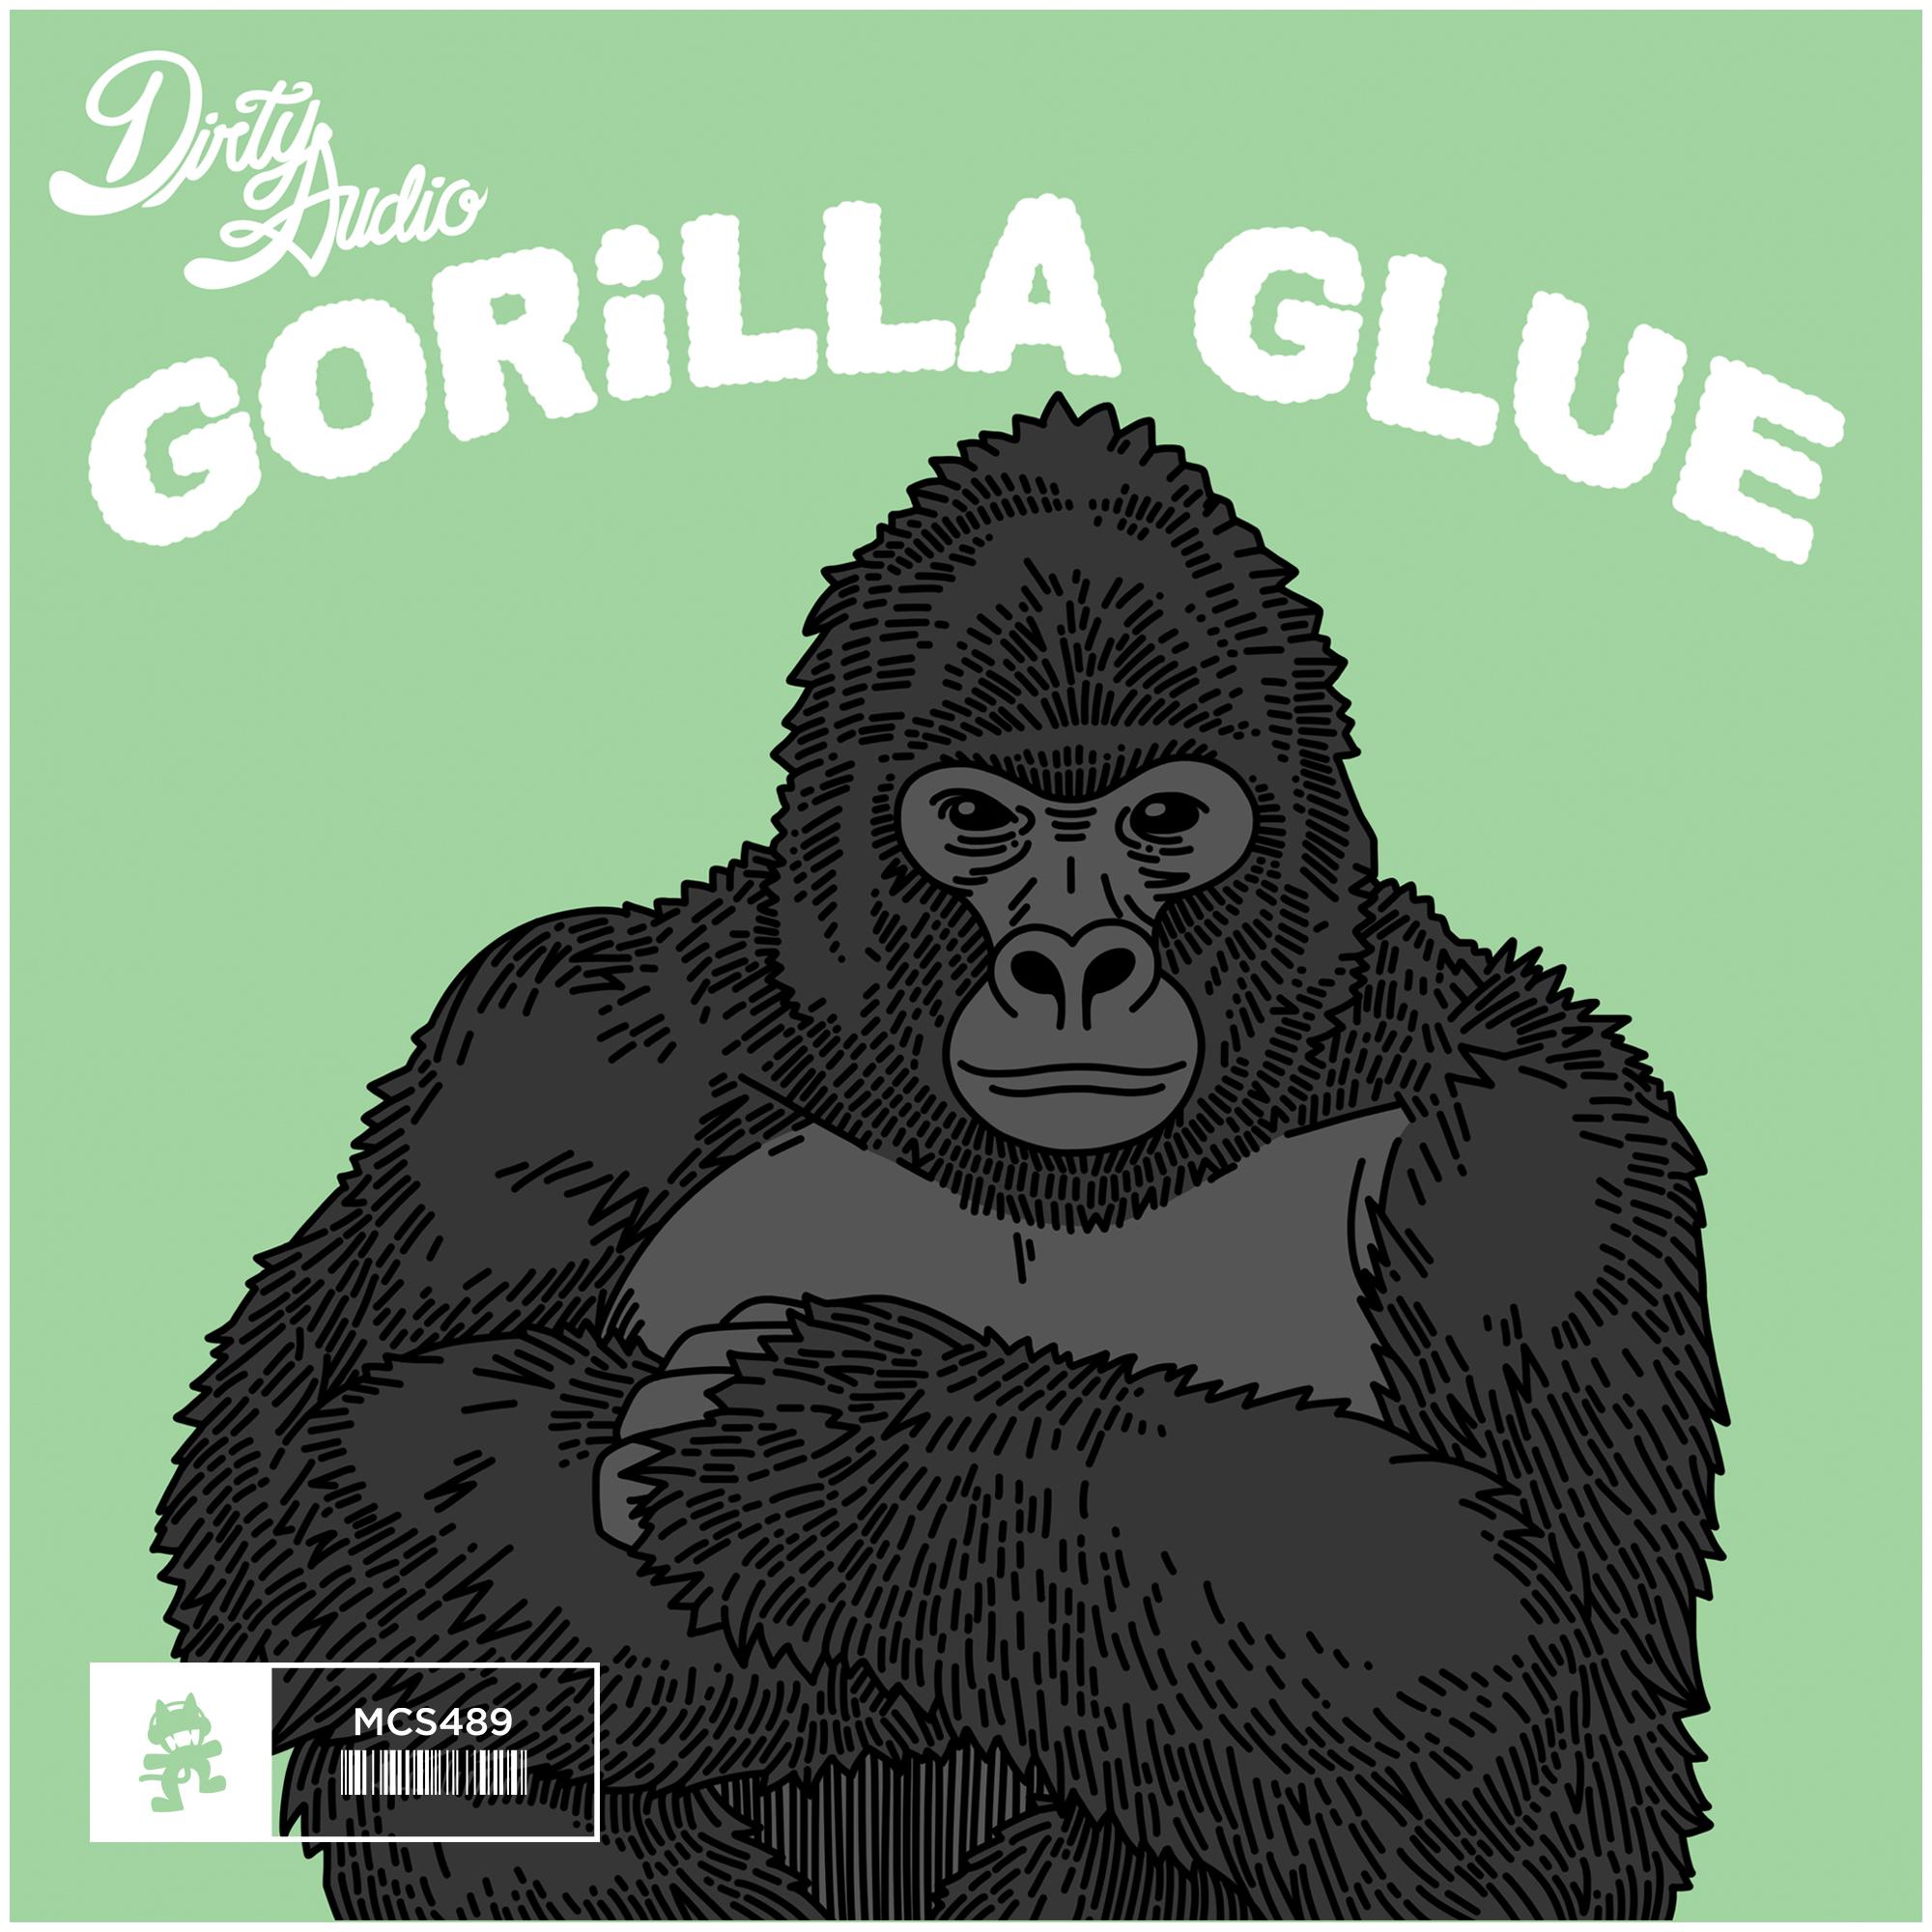 Dirty Audio - Gorilla Glue [Monstercat]   Your EDM